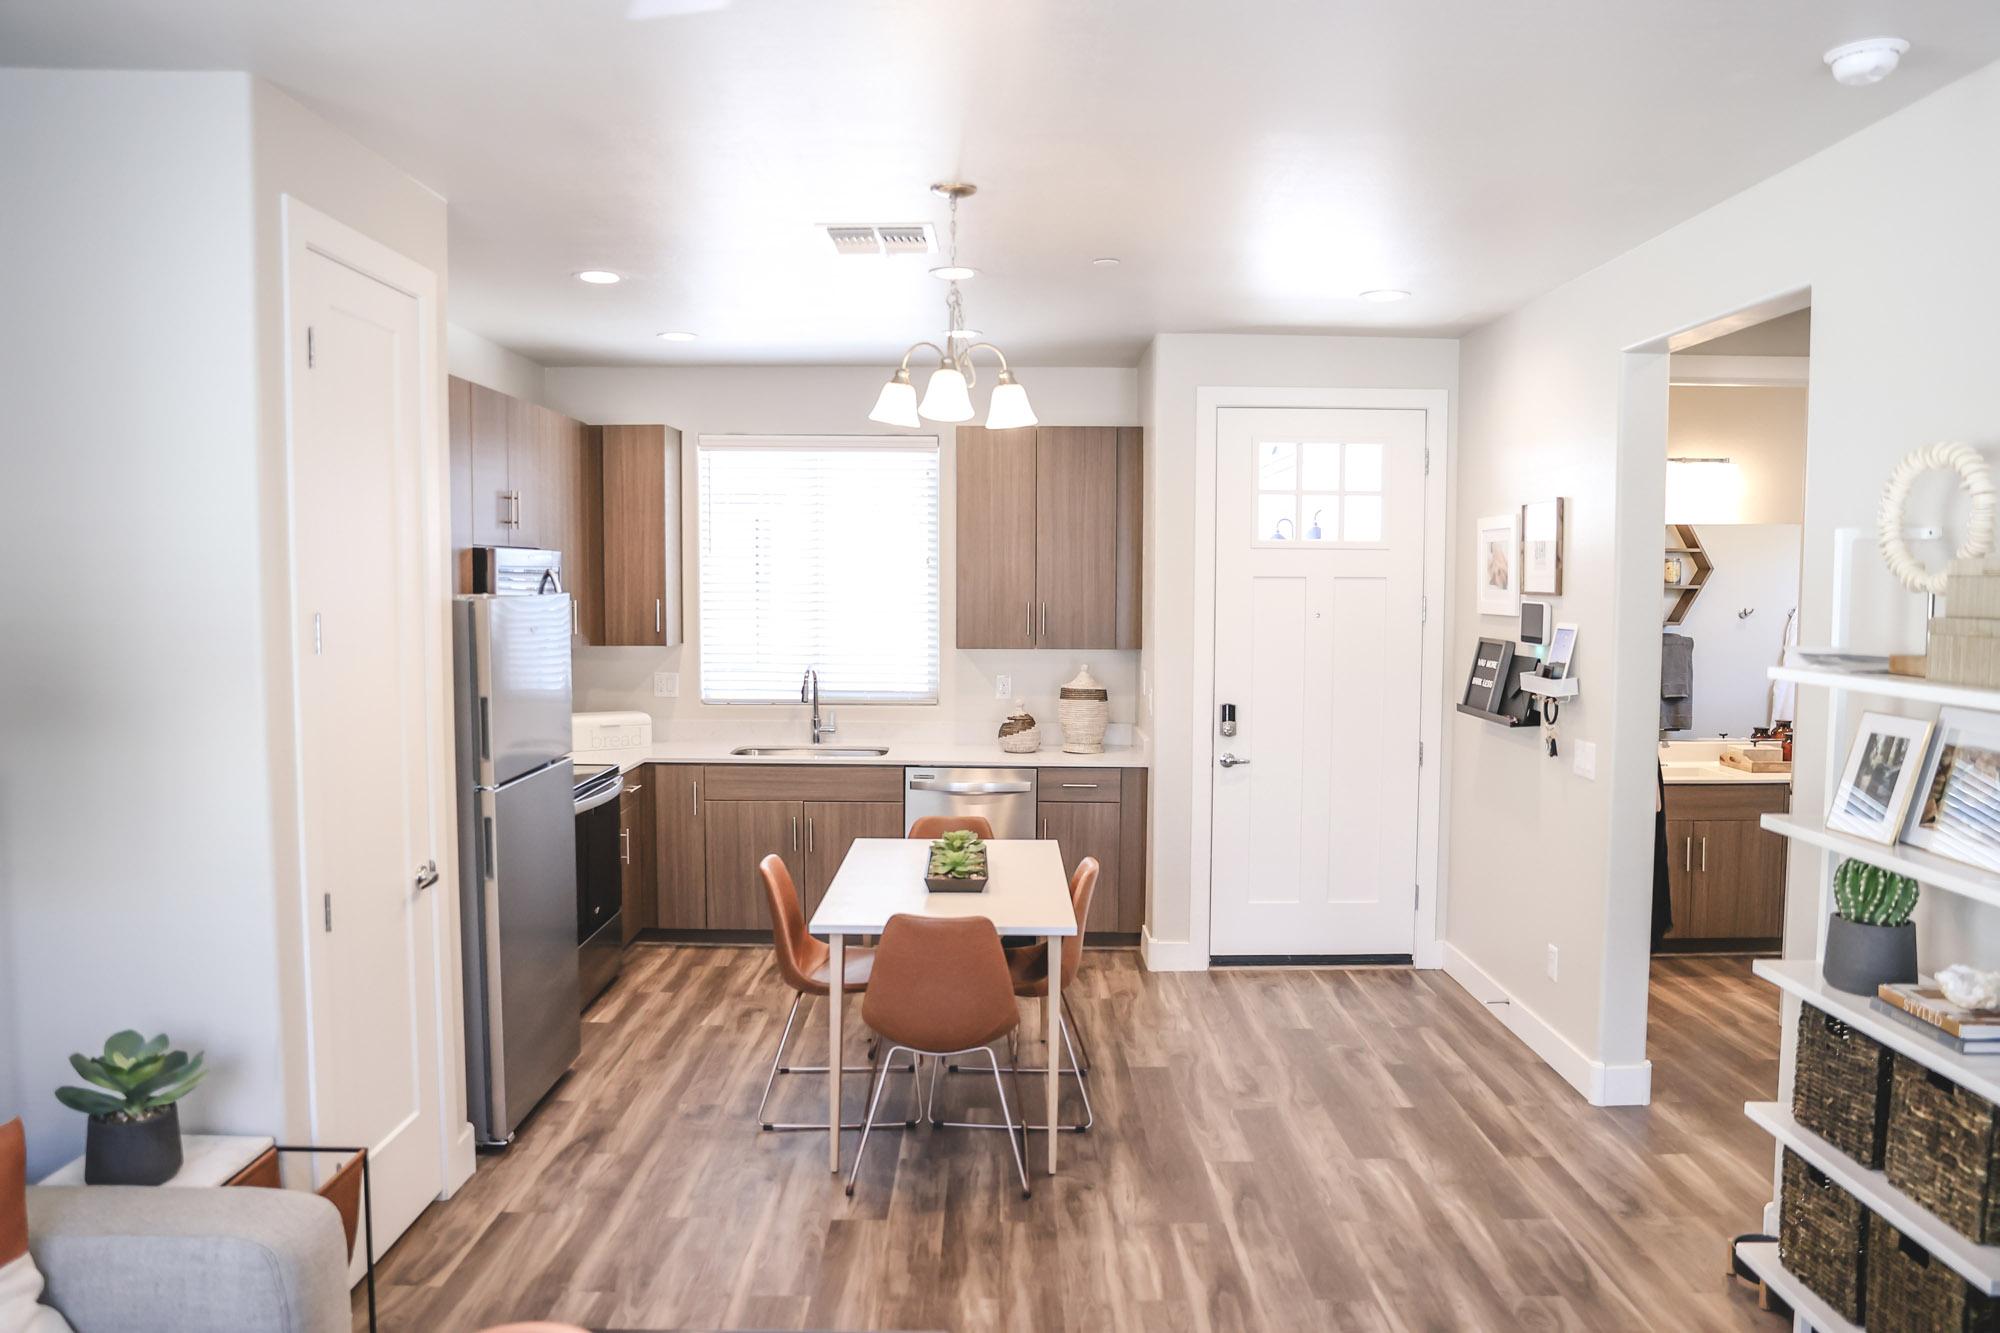 Beautiful Interior Spaces at Village at Harvard Crossing Apartments in Goodyear, AZ